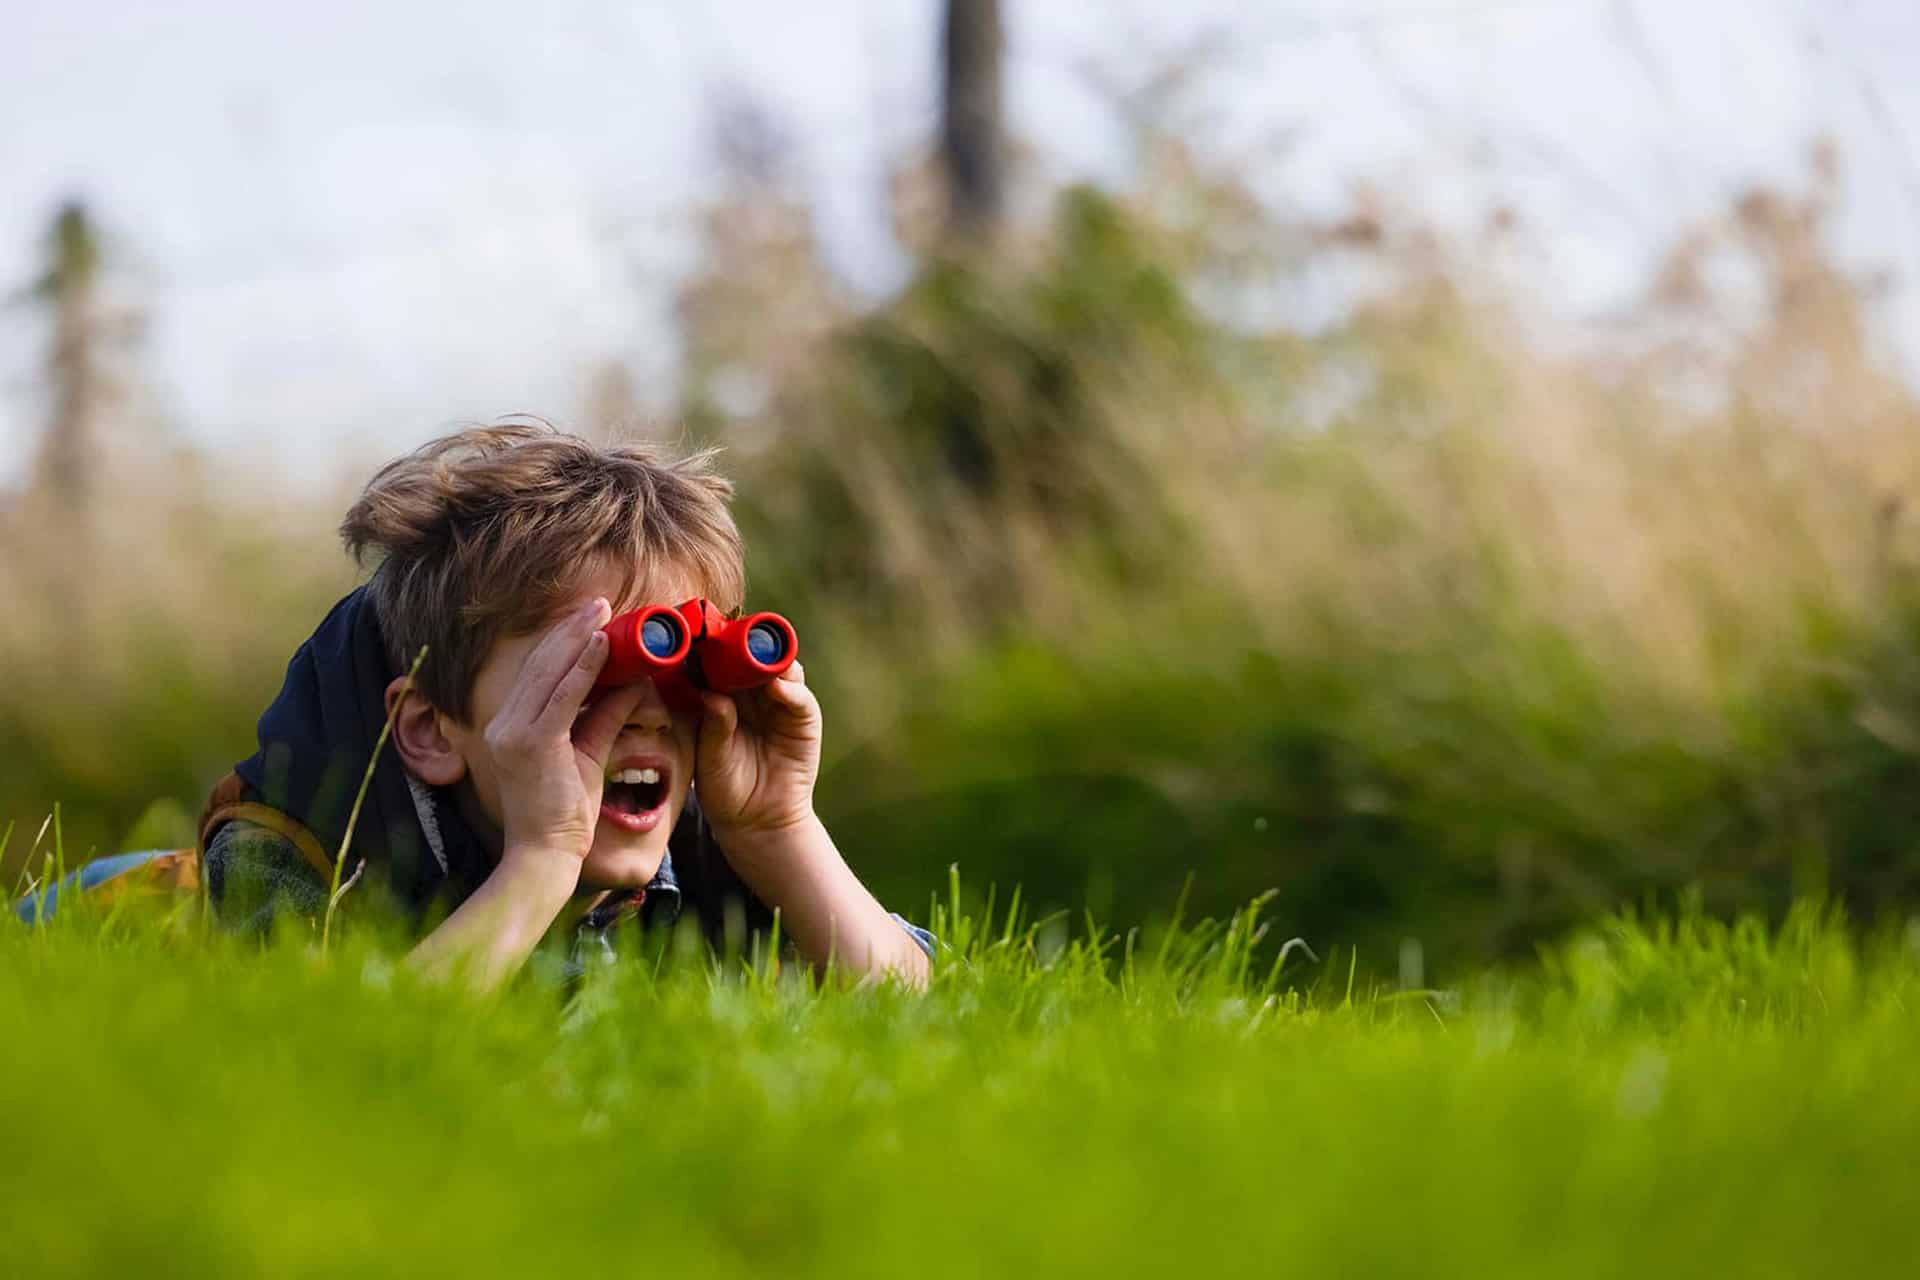 A boy lying in the grass looking through binoculars